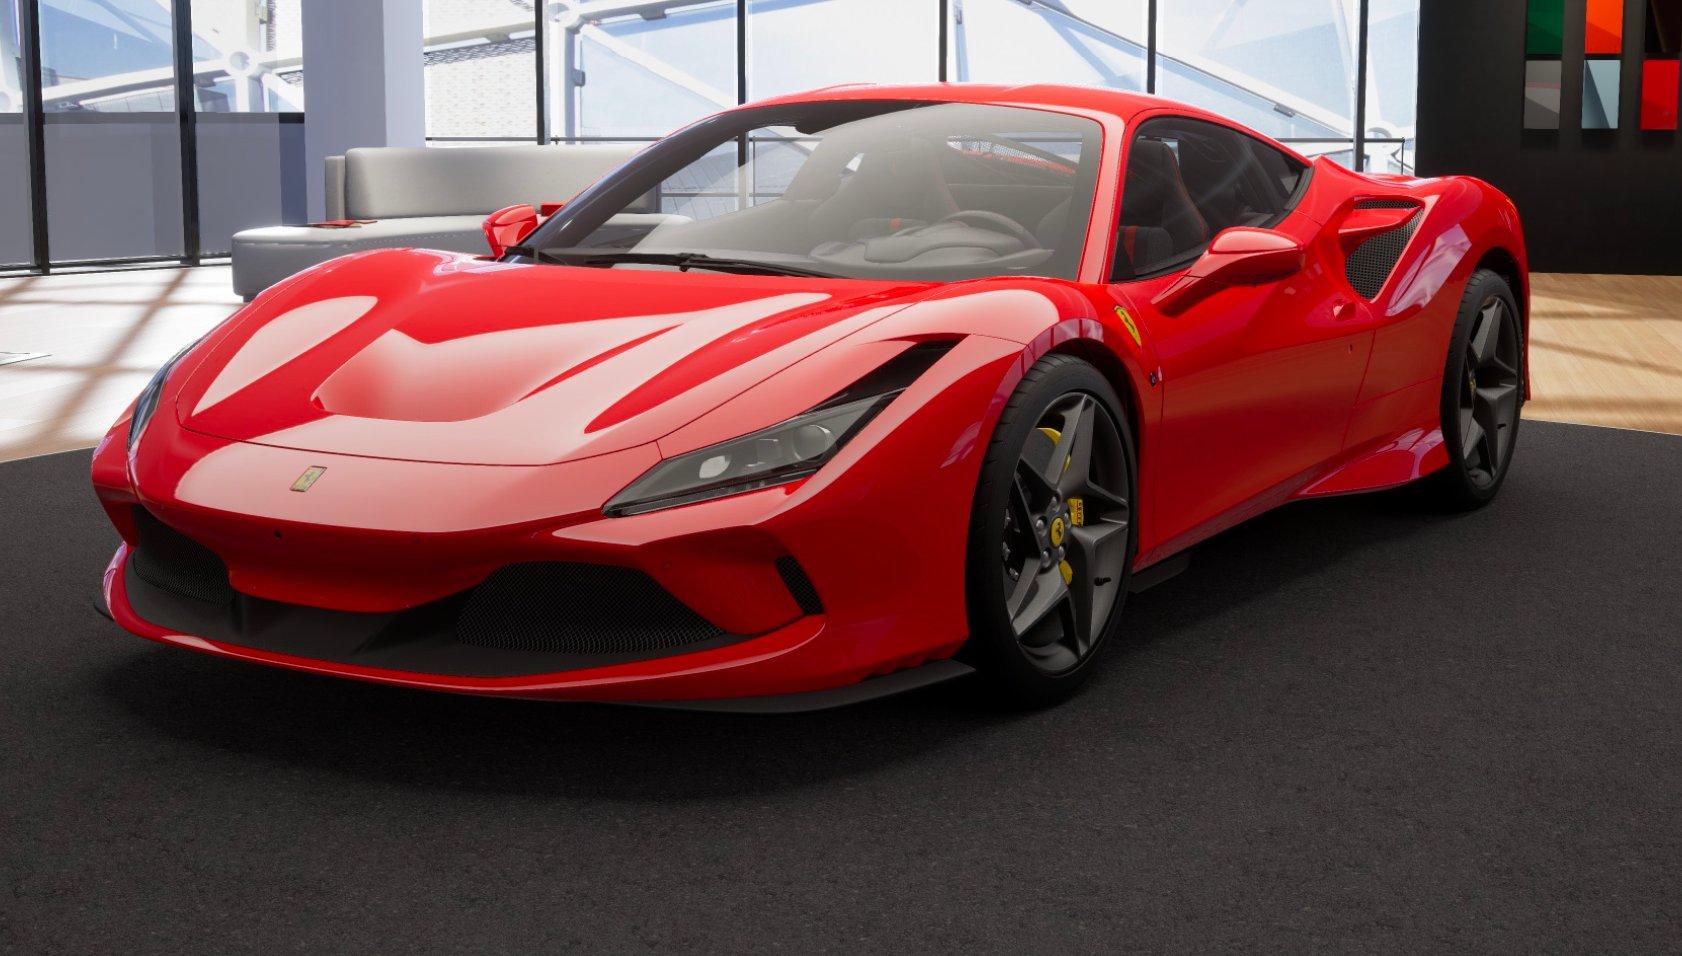 2020 Ferrari Ferrari F8 Tribute In Charlottenburg Berlin Germany For Sale 10835067